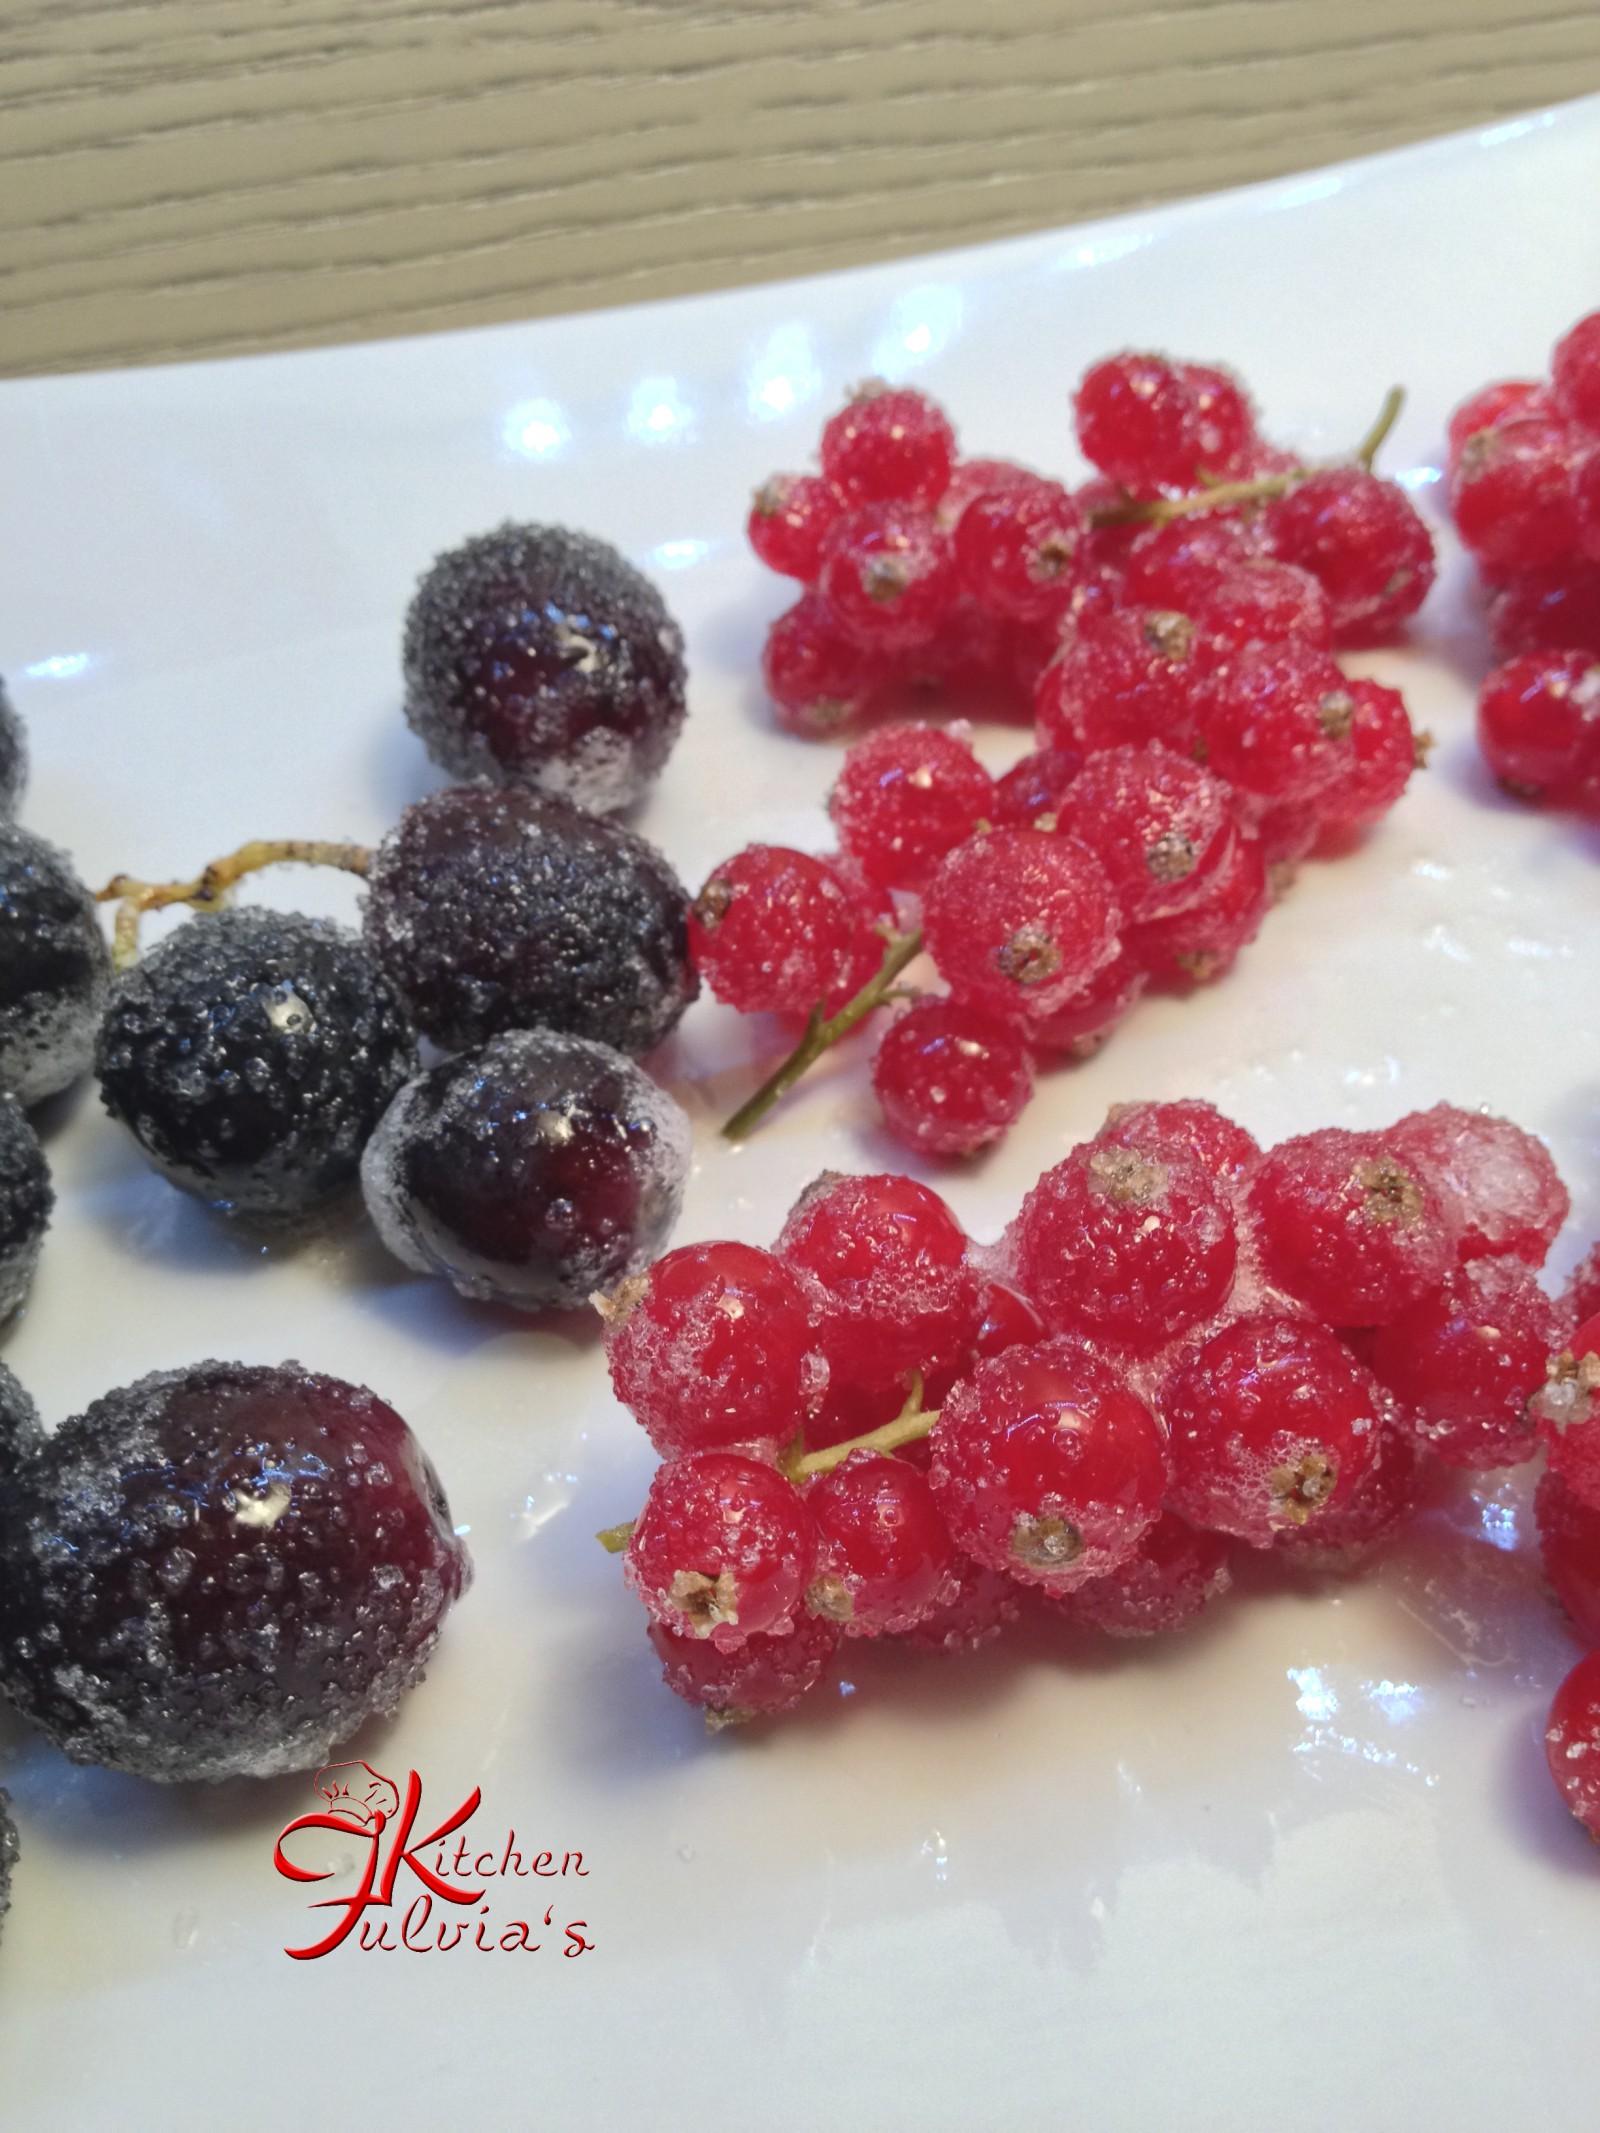 Tutorial frutta brinata